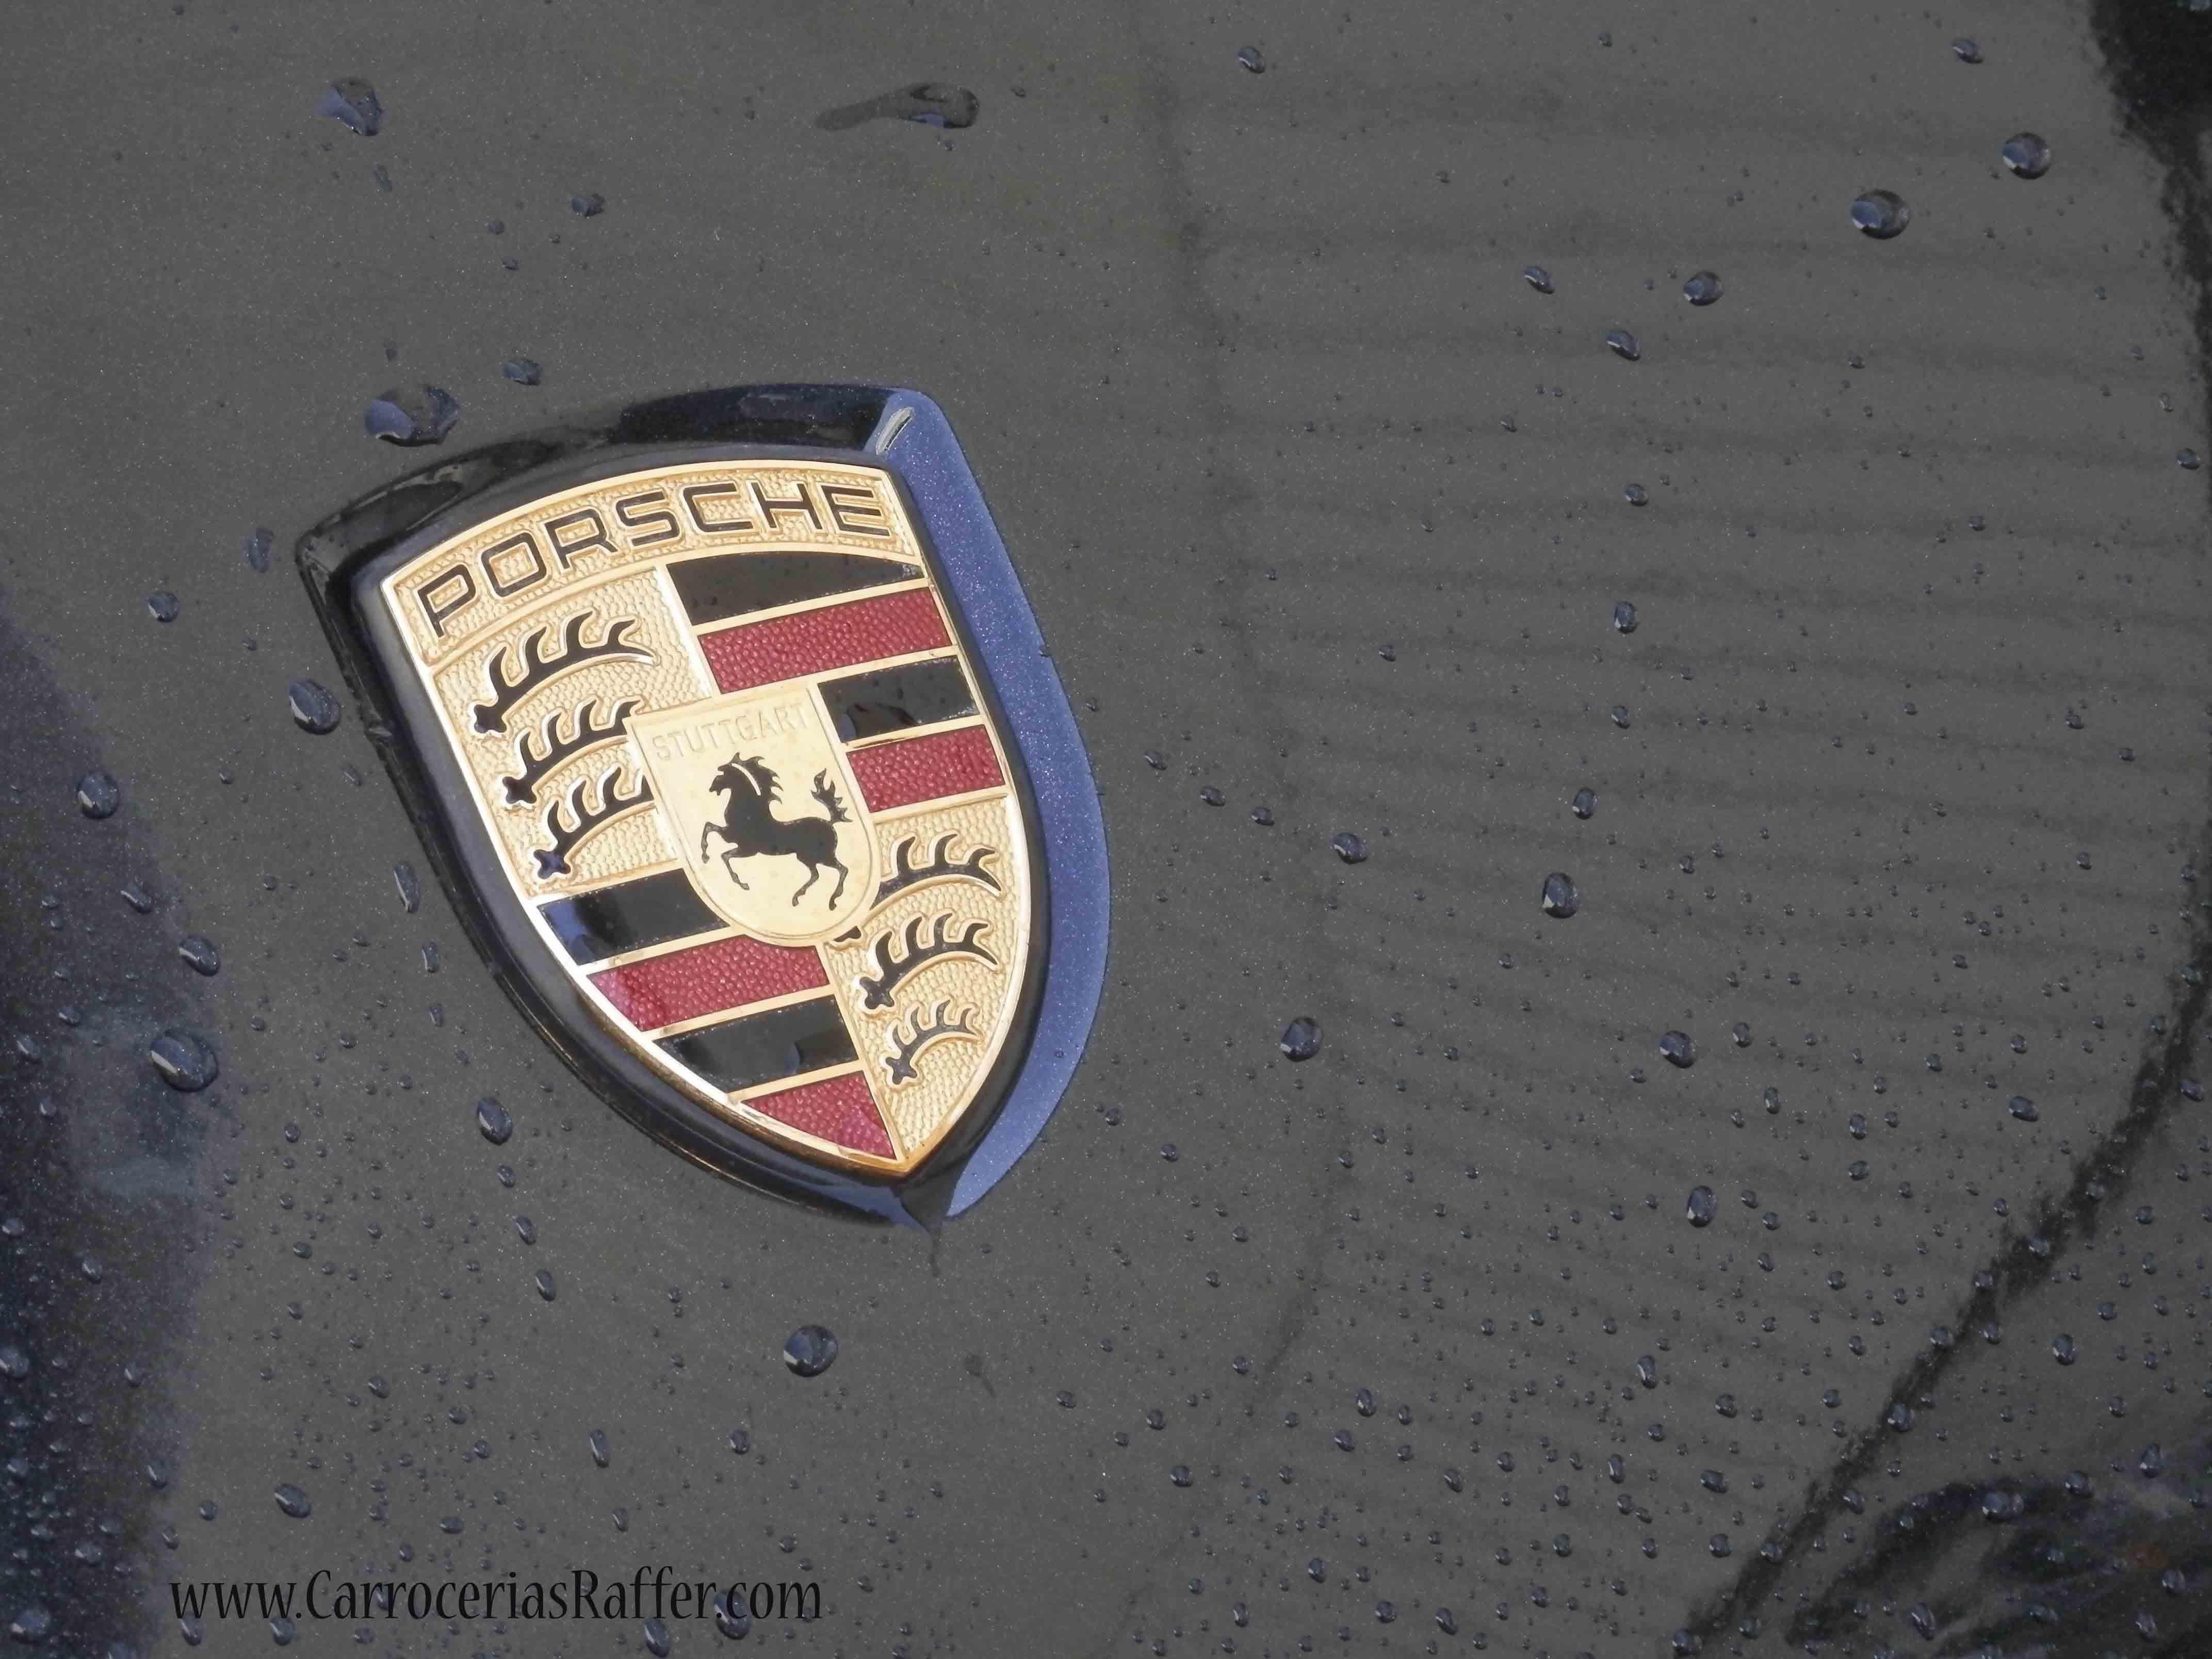 Nueva joya visita Raffer: Porsche Cayenne S.